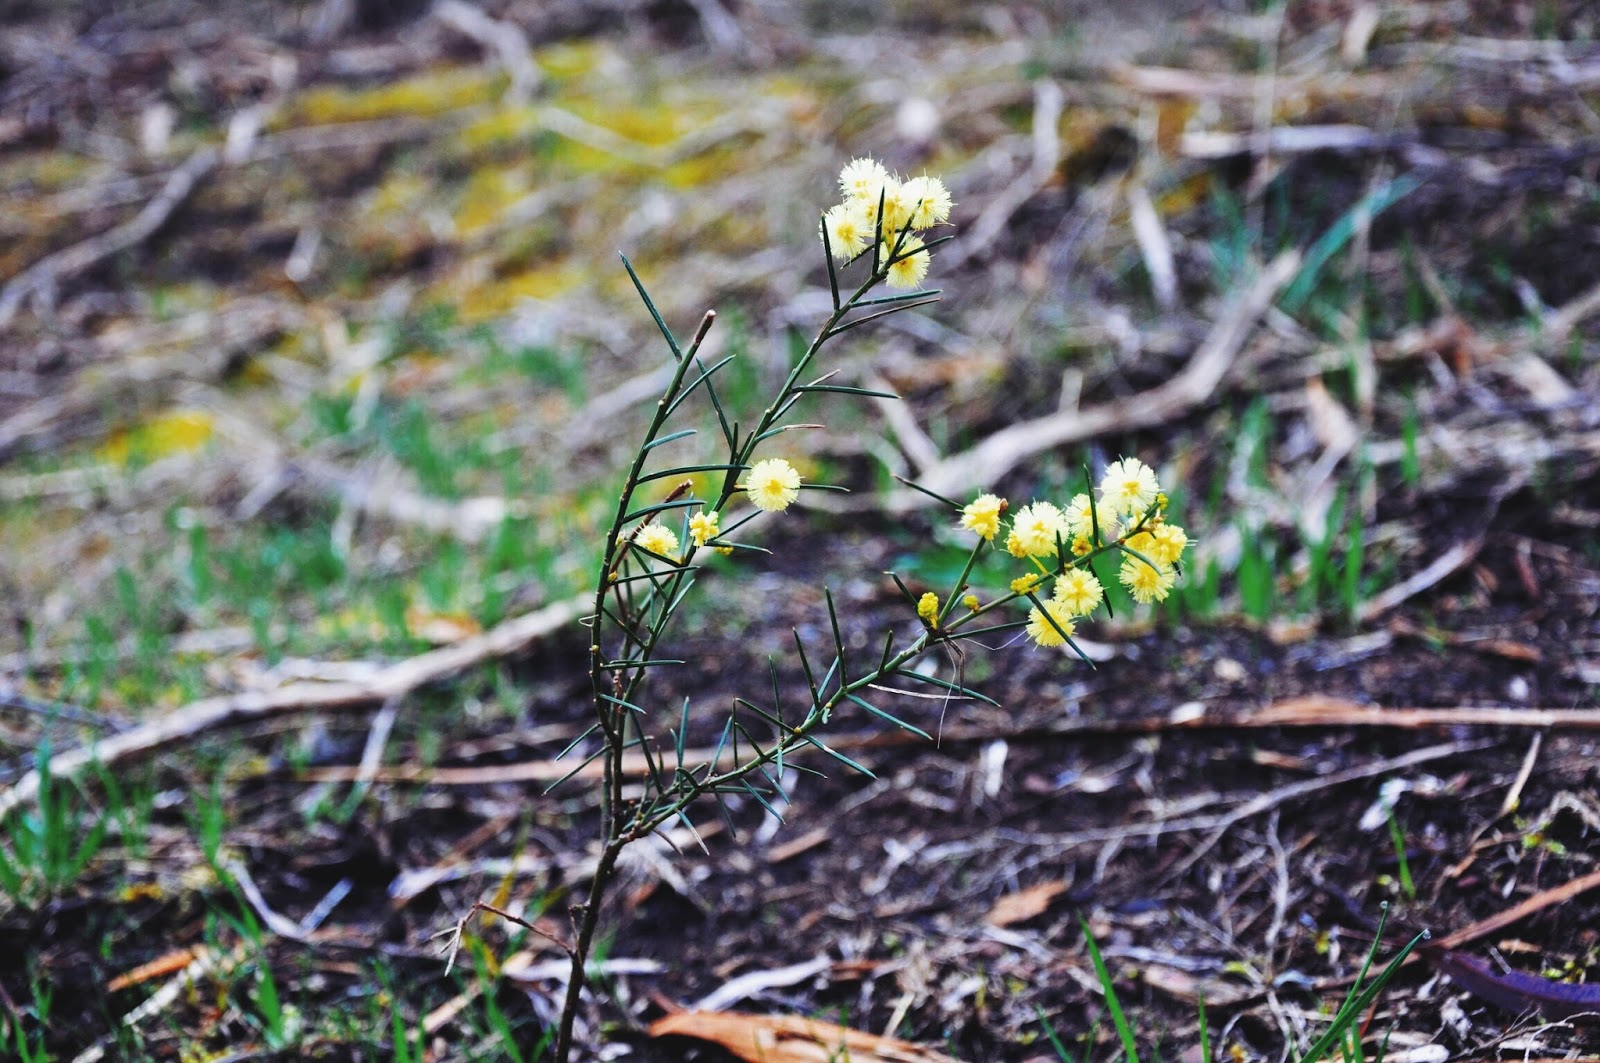 hiking outdoors nature plants wattle